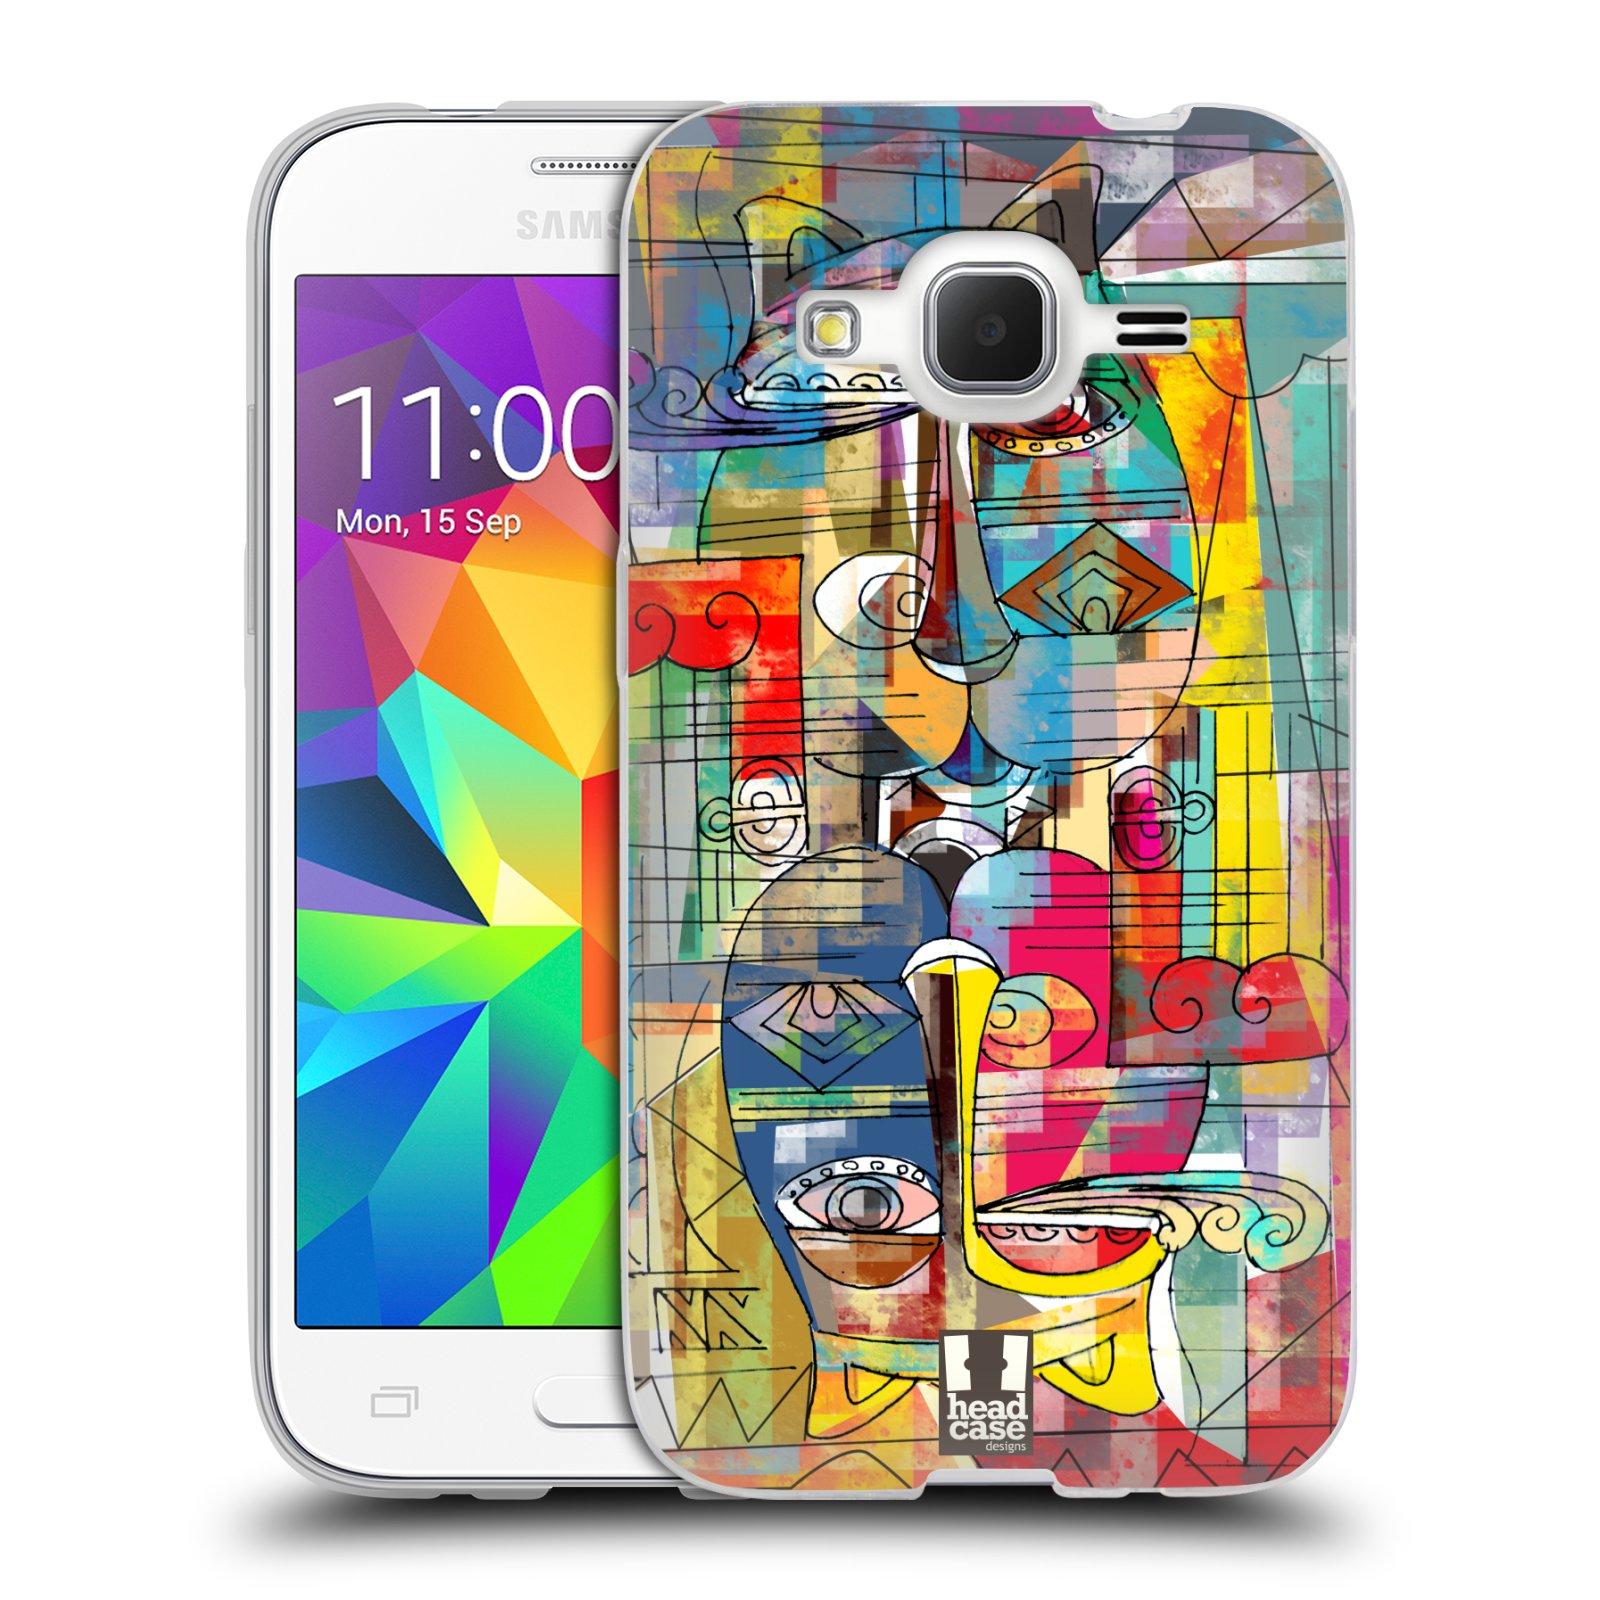 Silikonové pouzdro na mobil Samsung Galaxy Core Prime LTE HEAD CASE AZTEC MANX